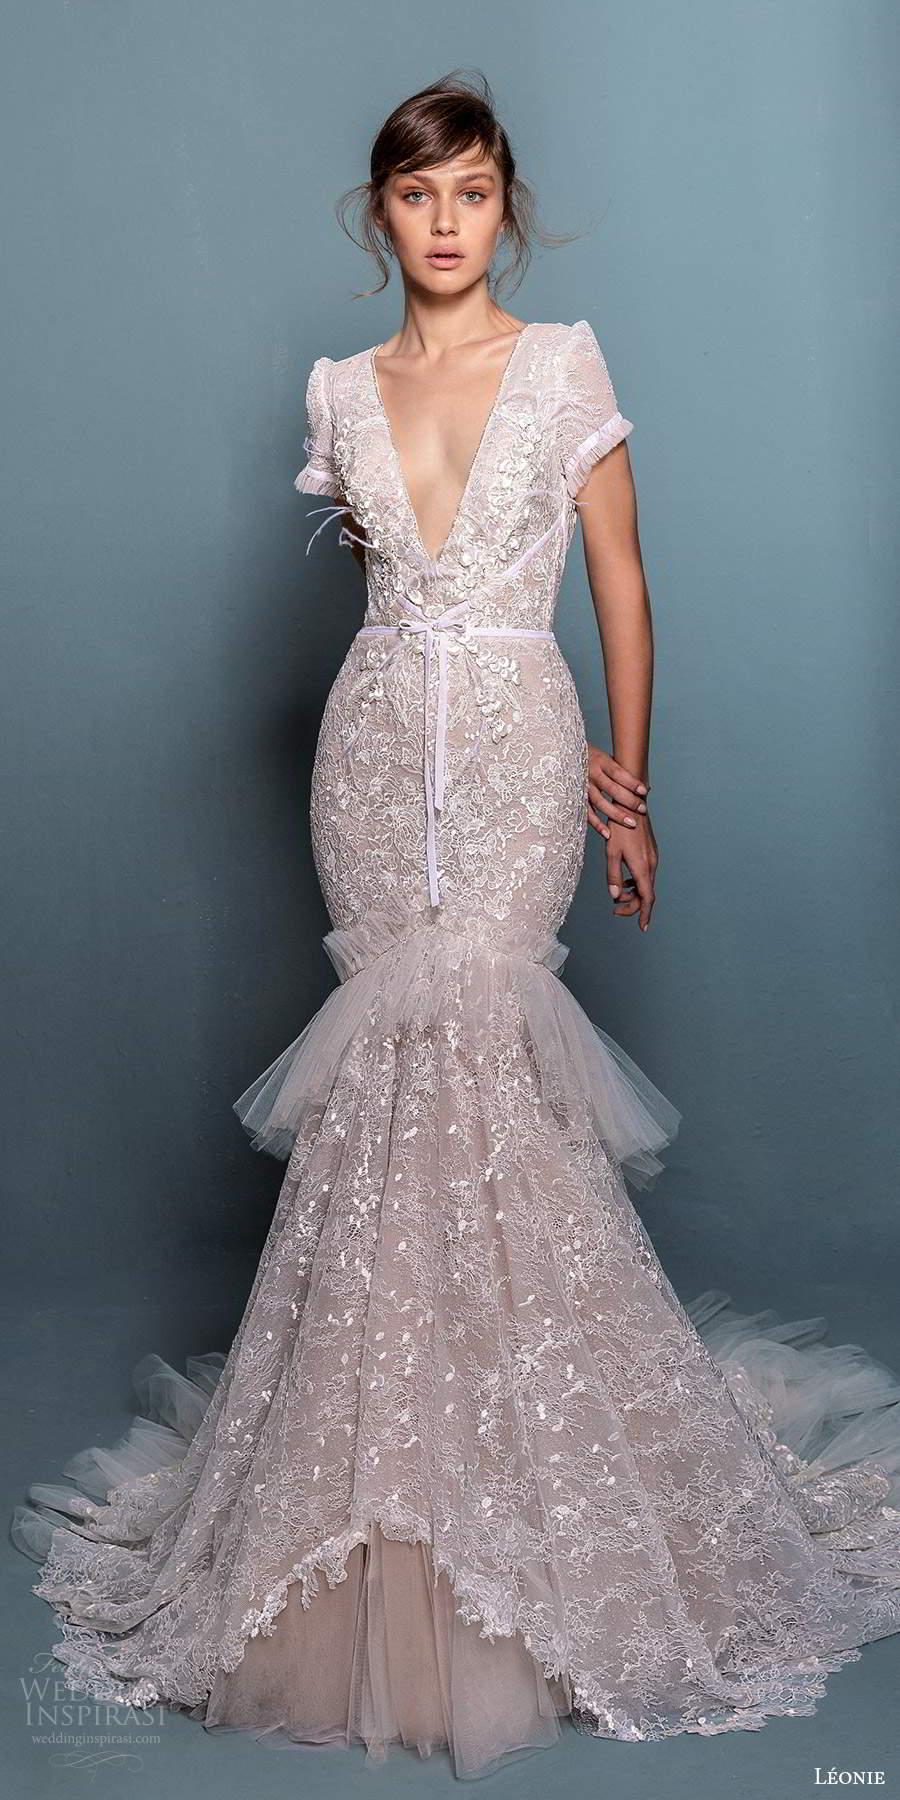 leonie bridal 2020 bridal short sleeves plunging v neckline fully embellished lace fit flare mermaid wedding dress chapel train (4) mv